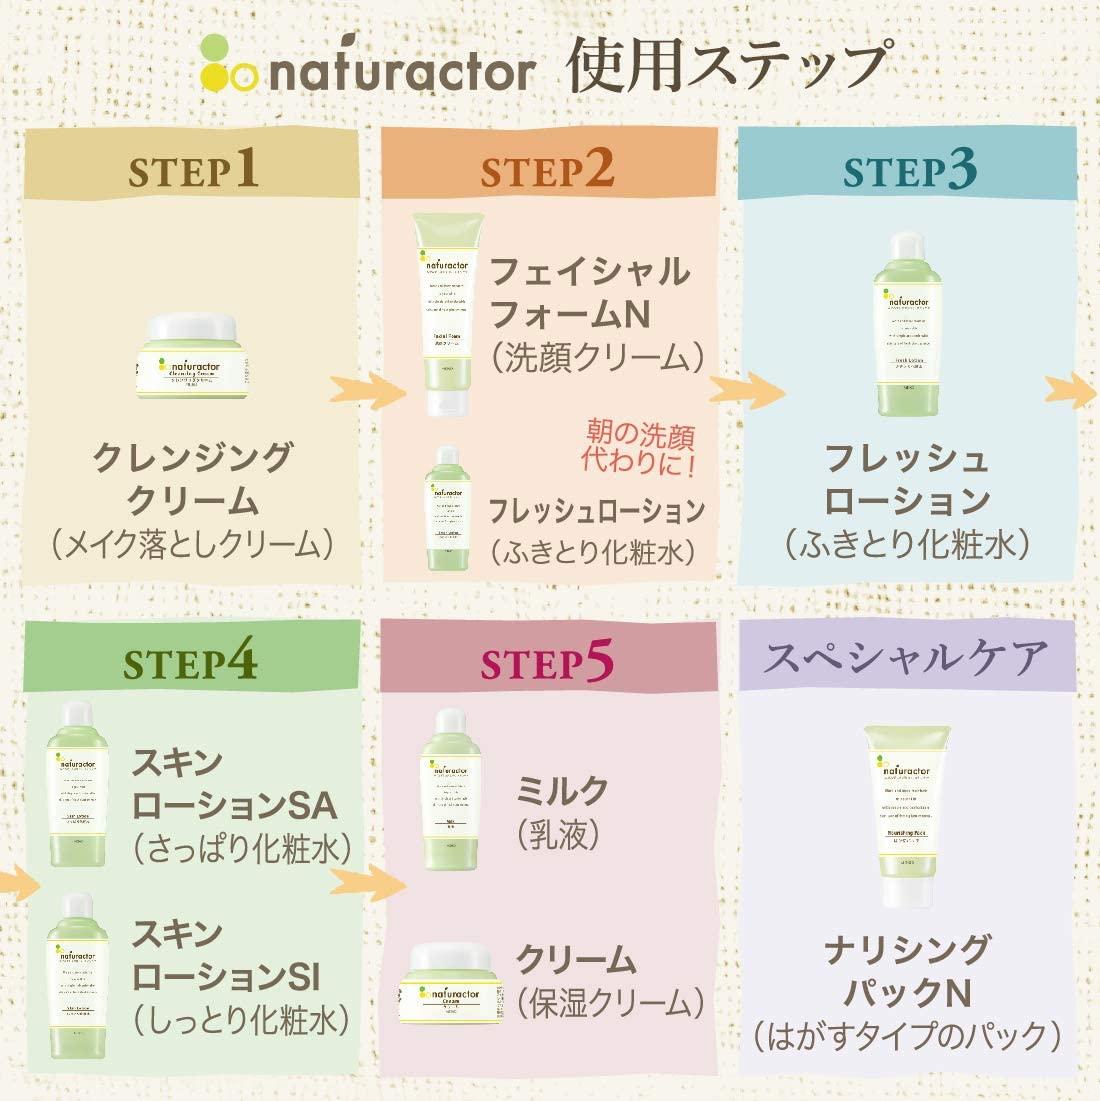 naturactor(ナチュラクター)フレッシュローション(ふきとり化粧水)の商品画像7